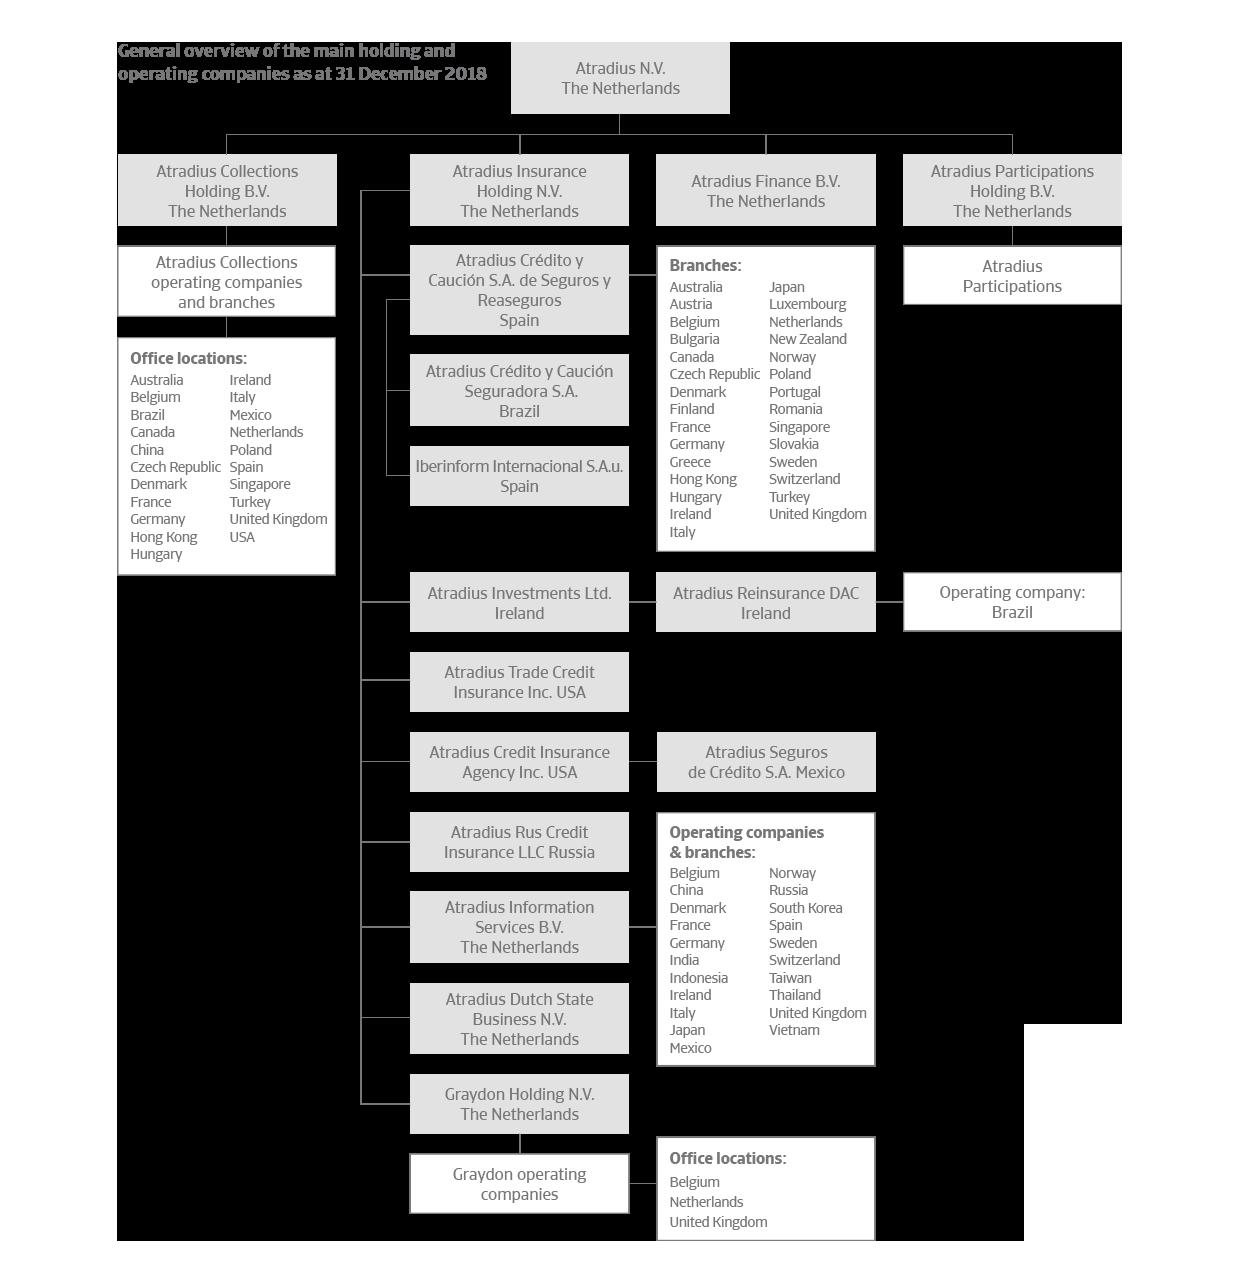 Atradius organisation chart